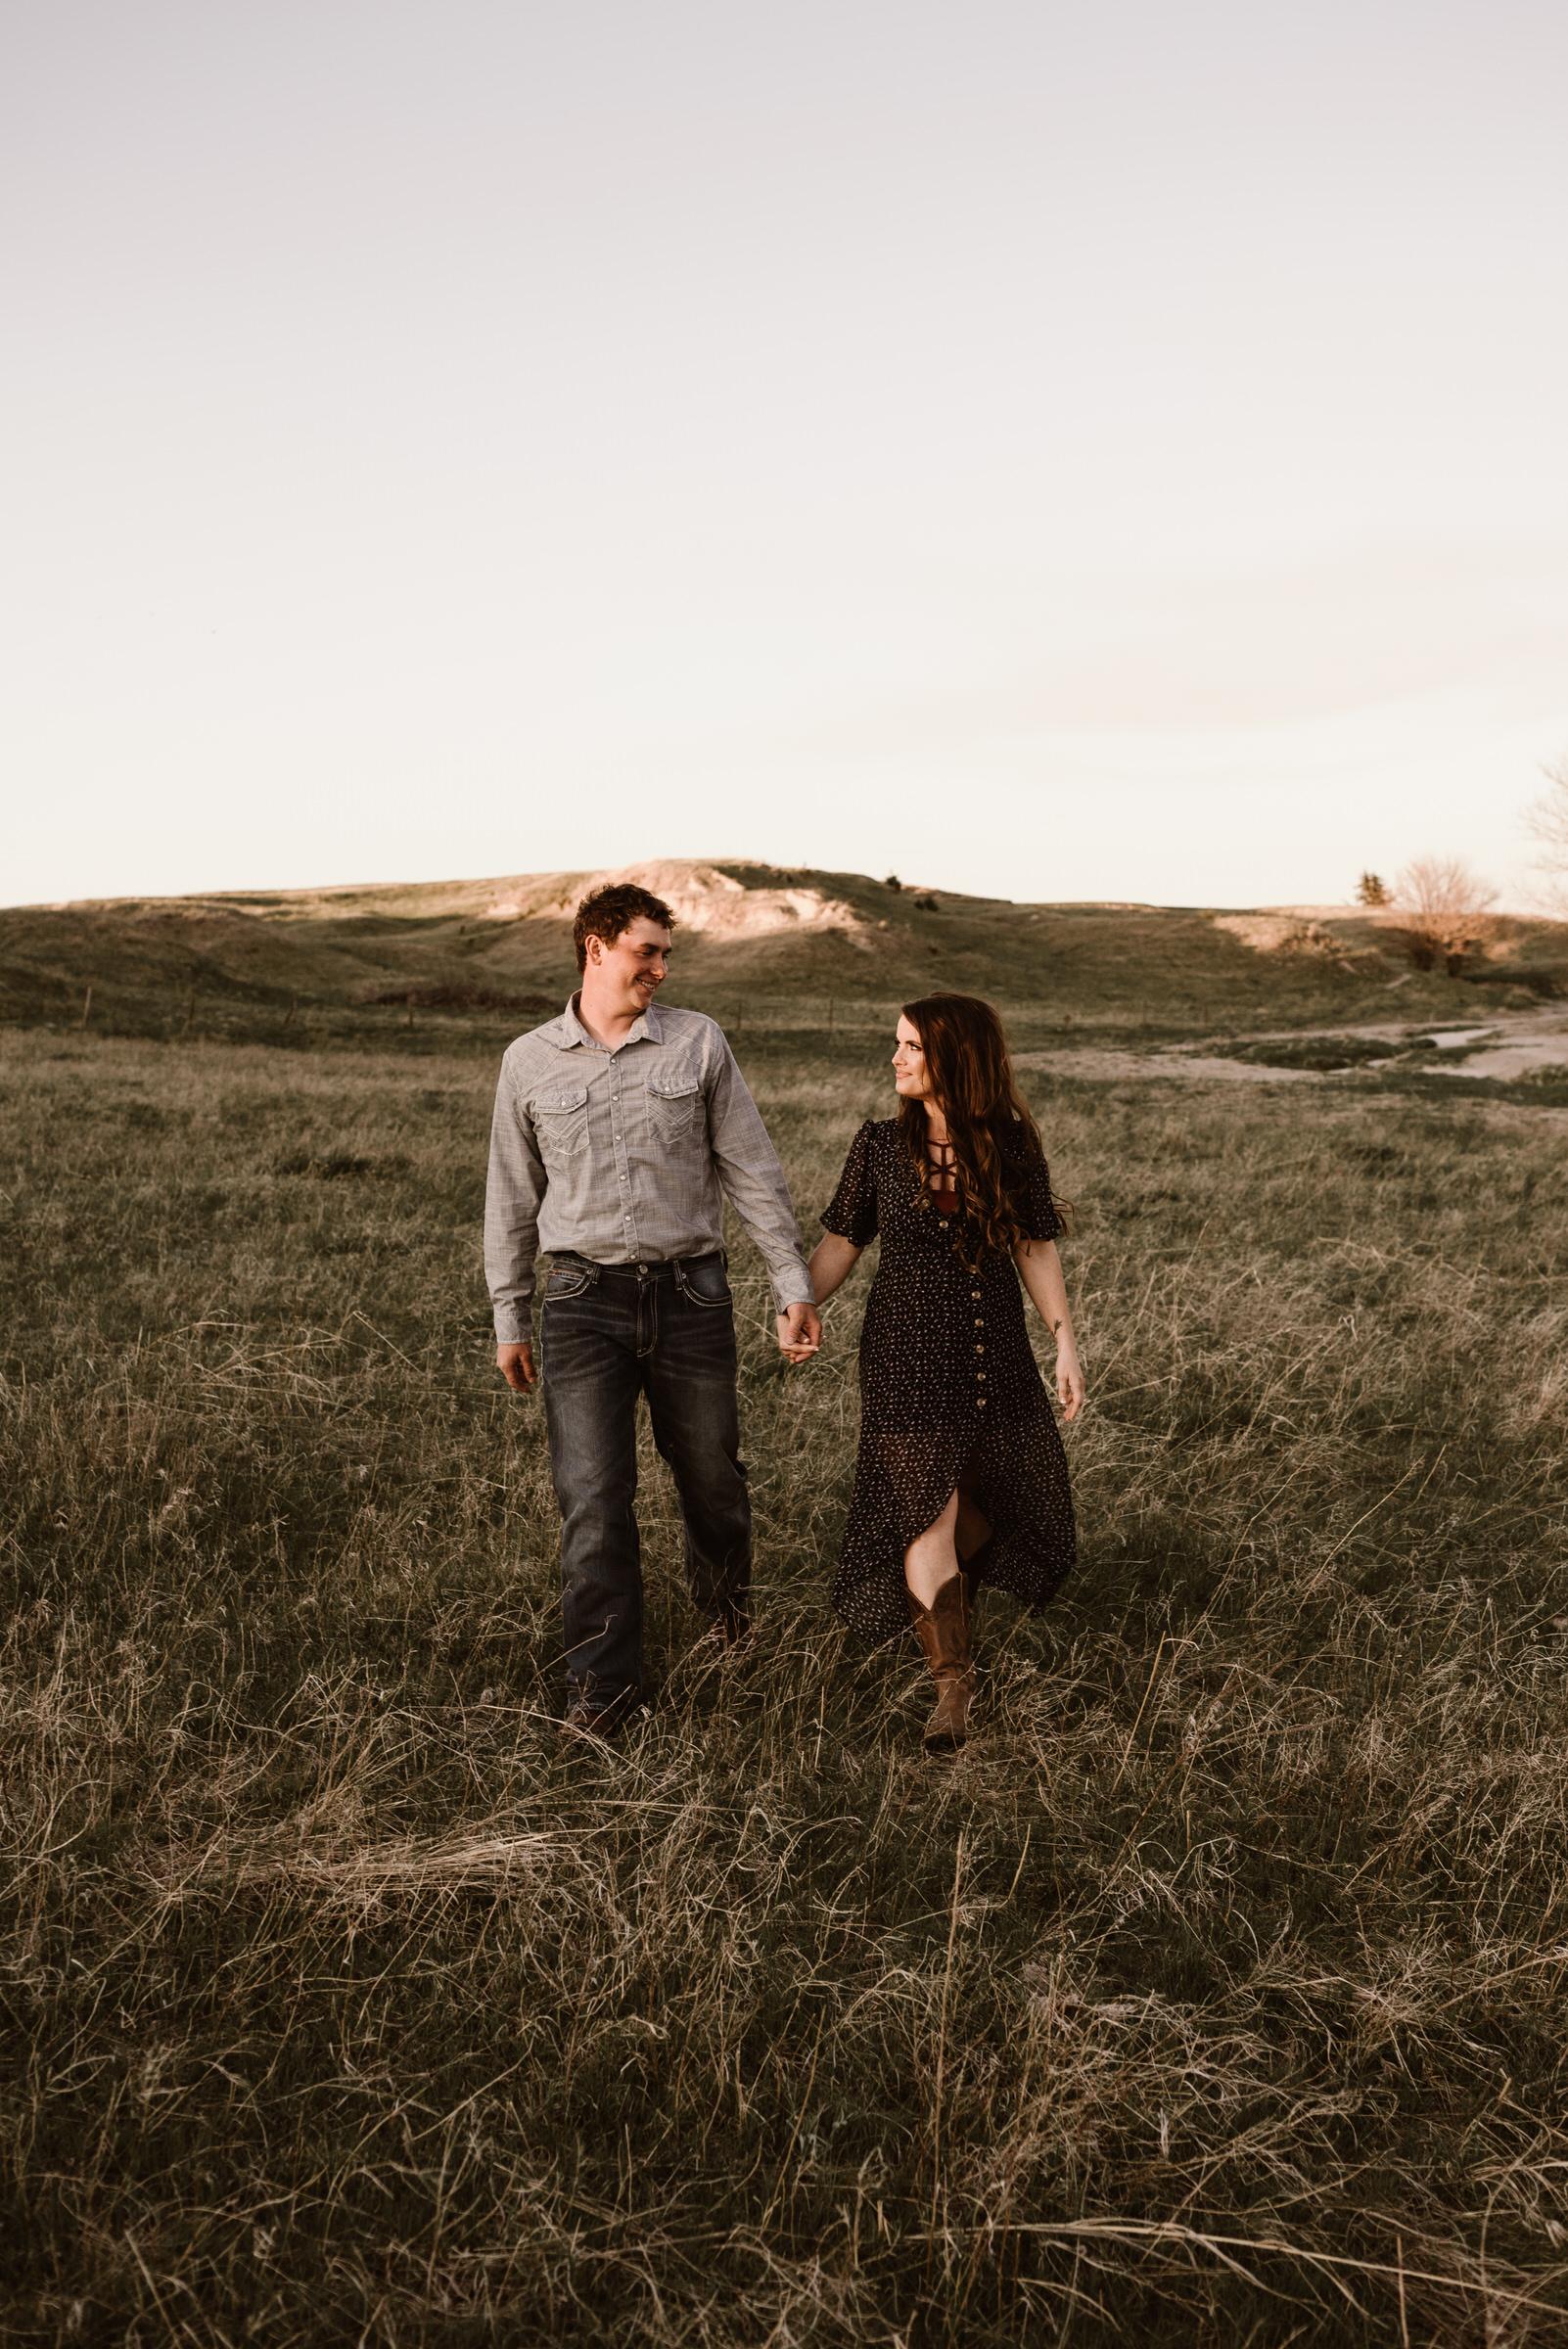 Sandhills-Nebraska-Engagement-Wedding-Photographer-Kaylie-Sirek-Photography-016.jpg